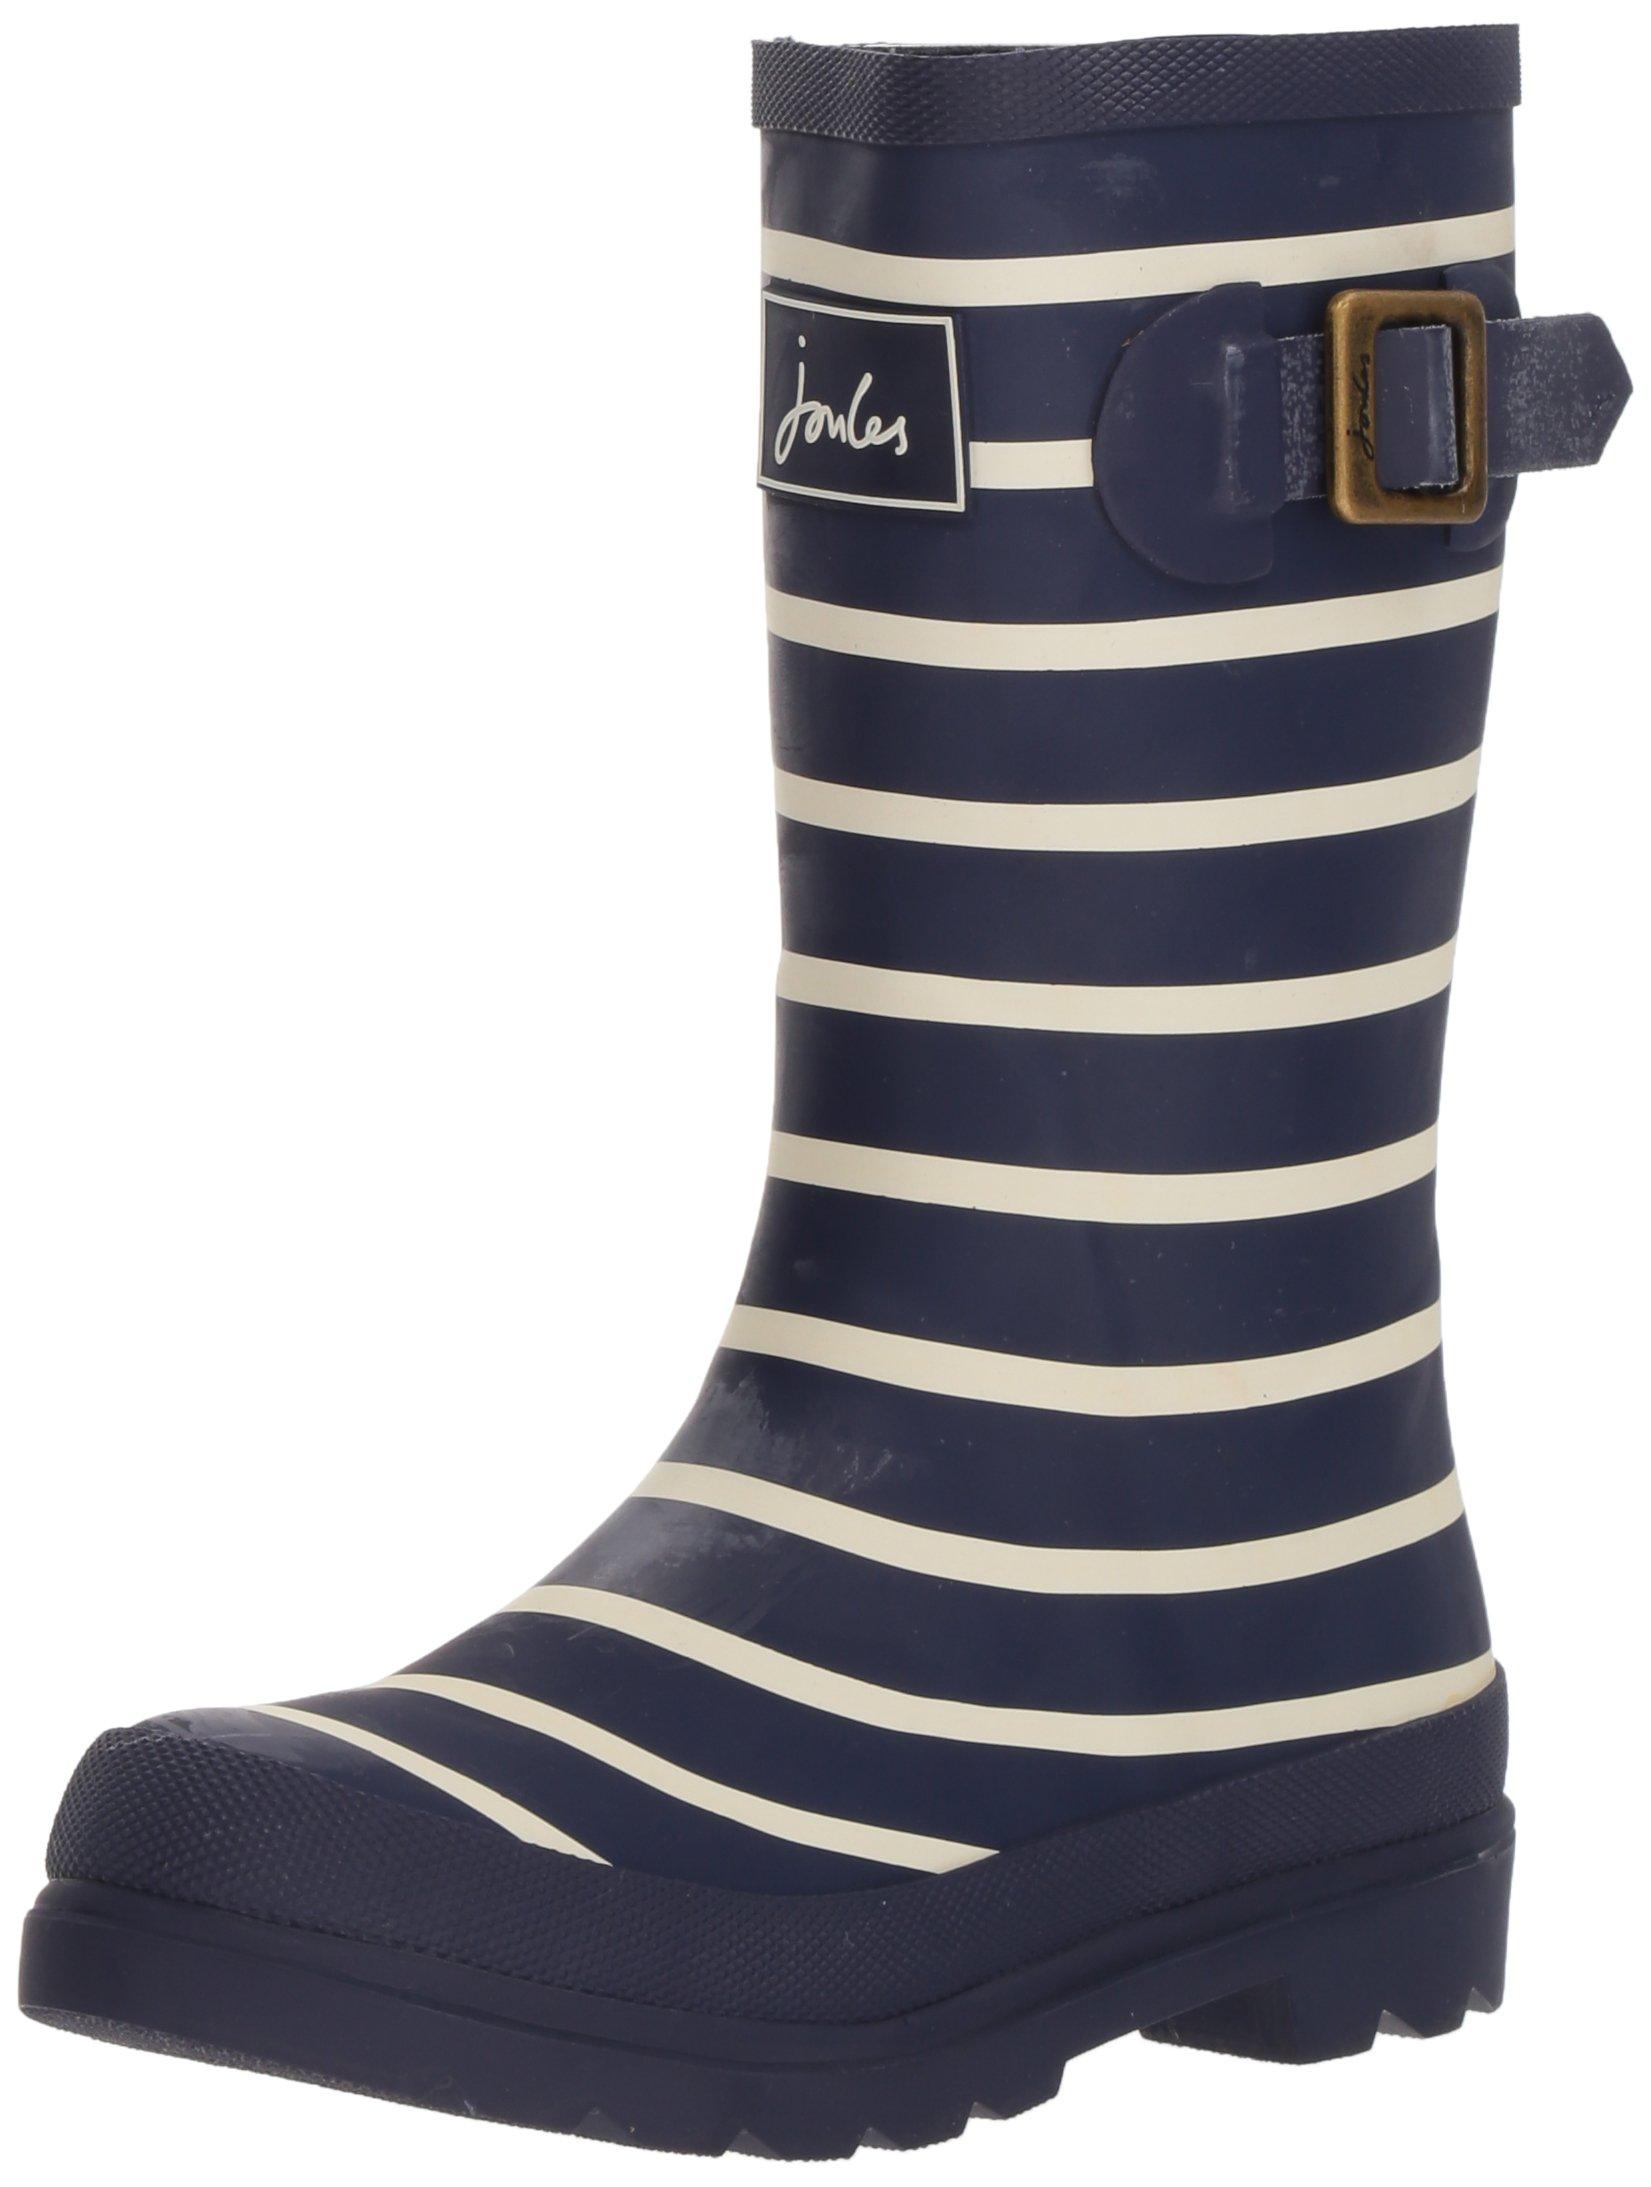 Joules JNR Boys Welly Rain Boot (Toddler/Little Kid/Big Kid), French Navy Stripe, 3 M US Little Kid